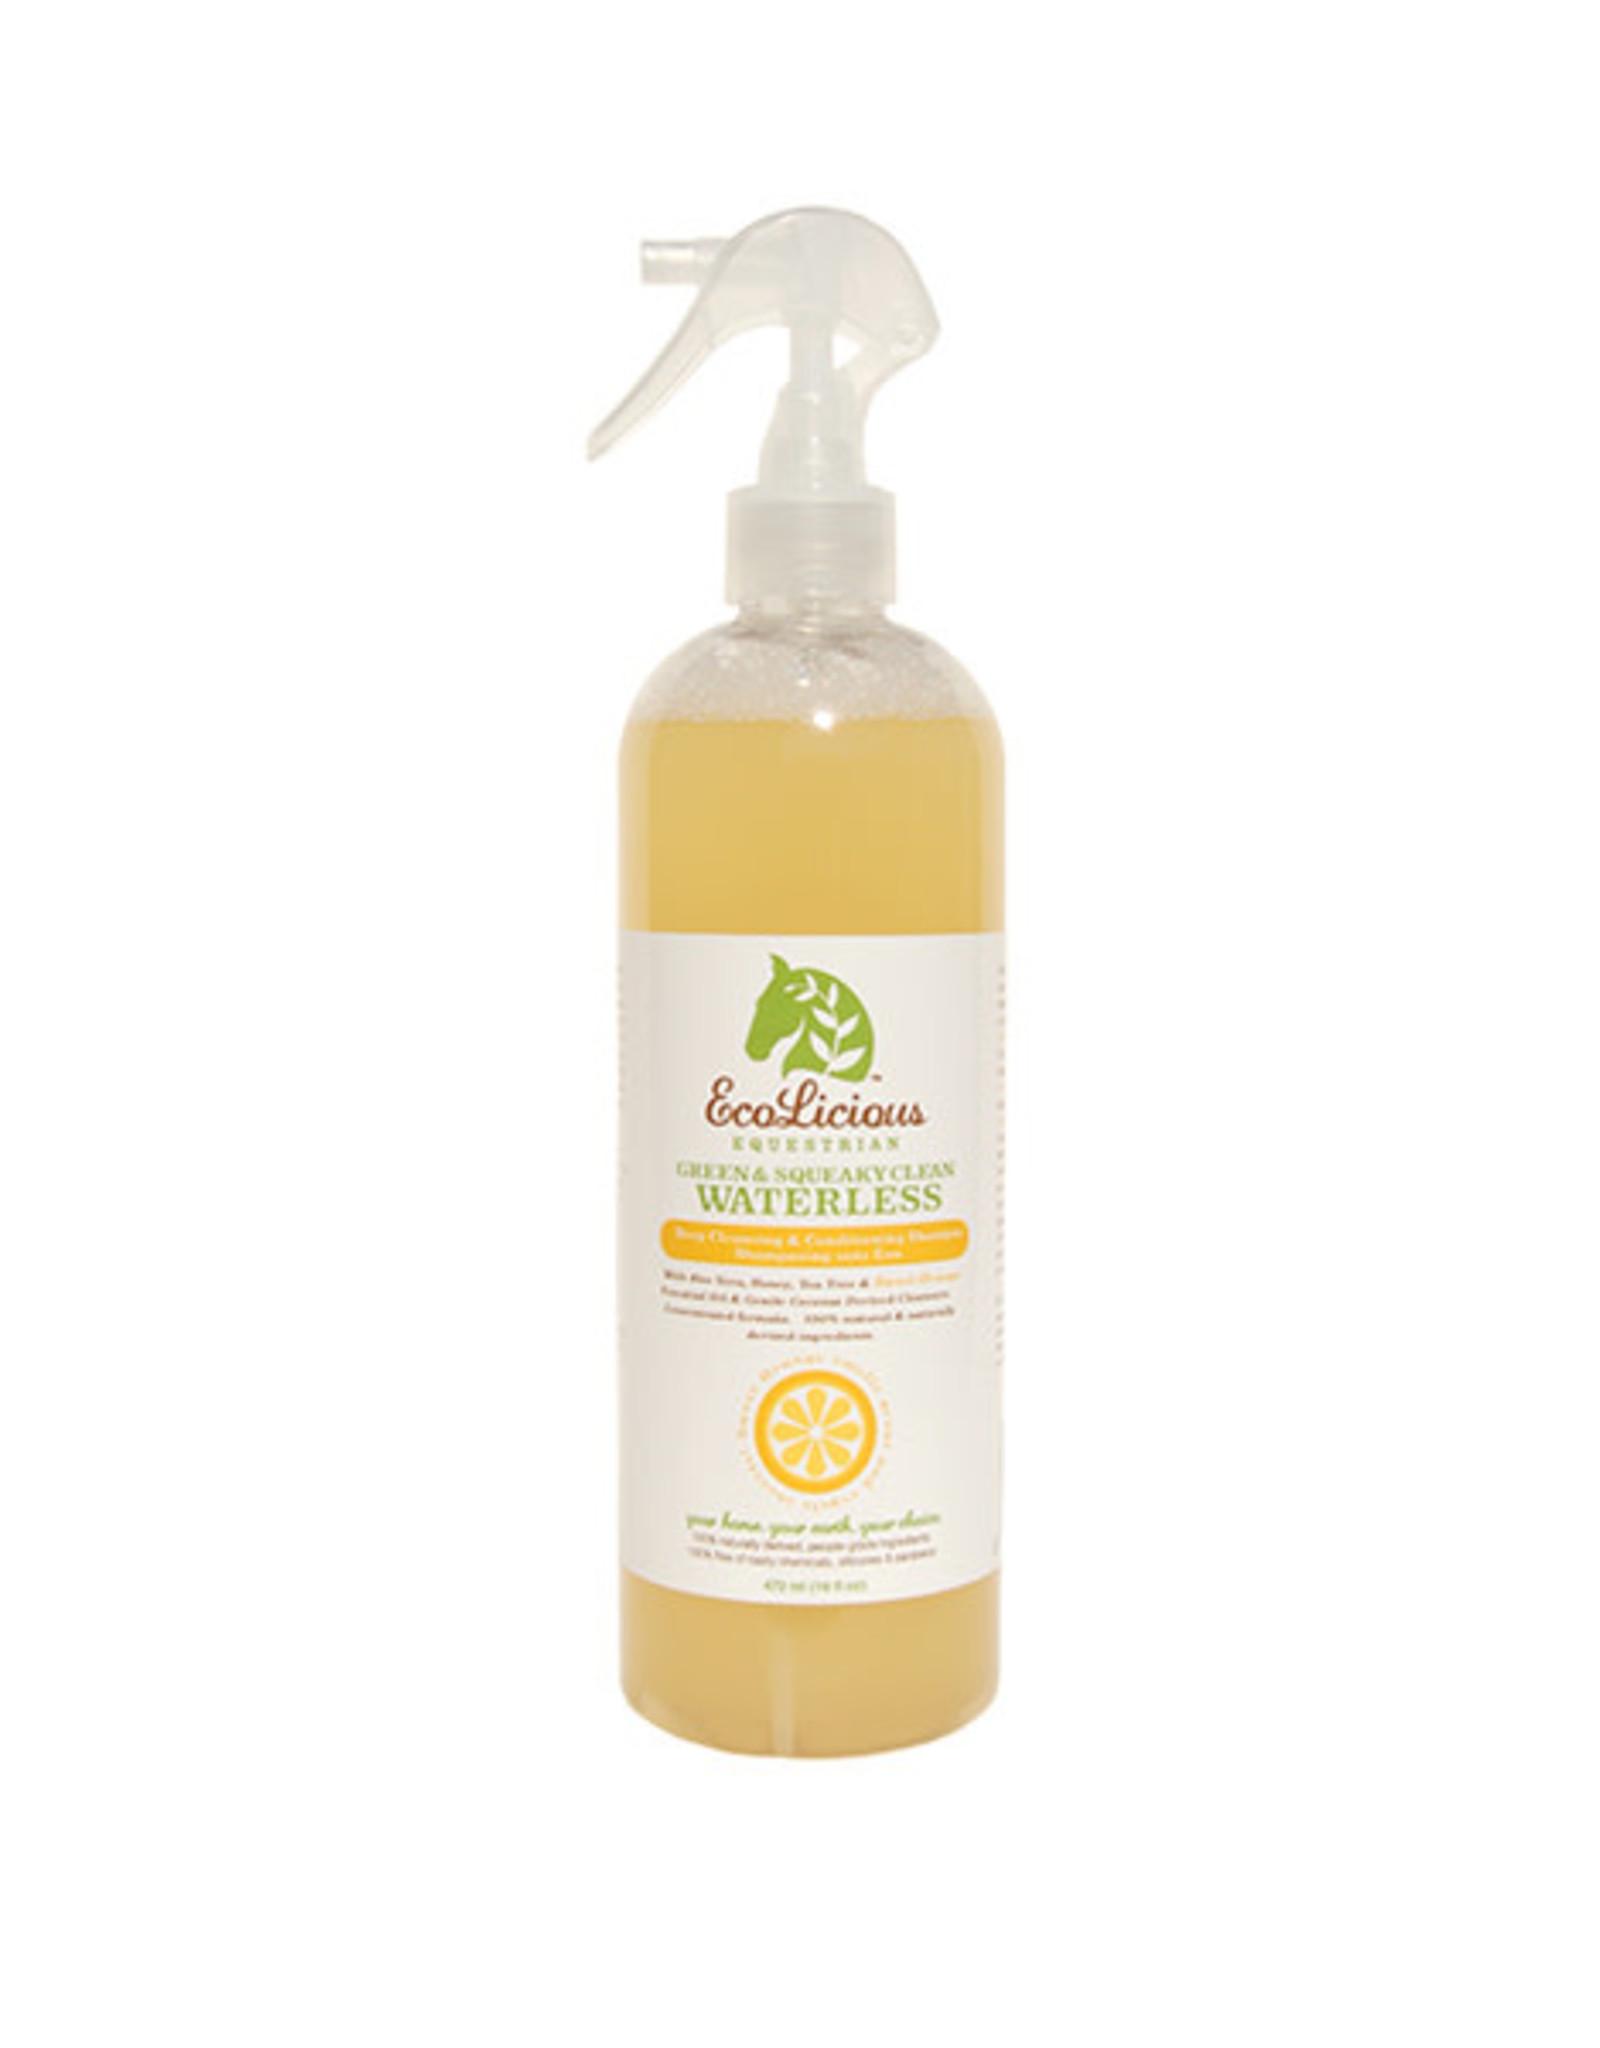 EcoLicious GREEN & SQUEAKY CLEAN WATERLESS SHAMPOO 472 ML